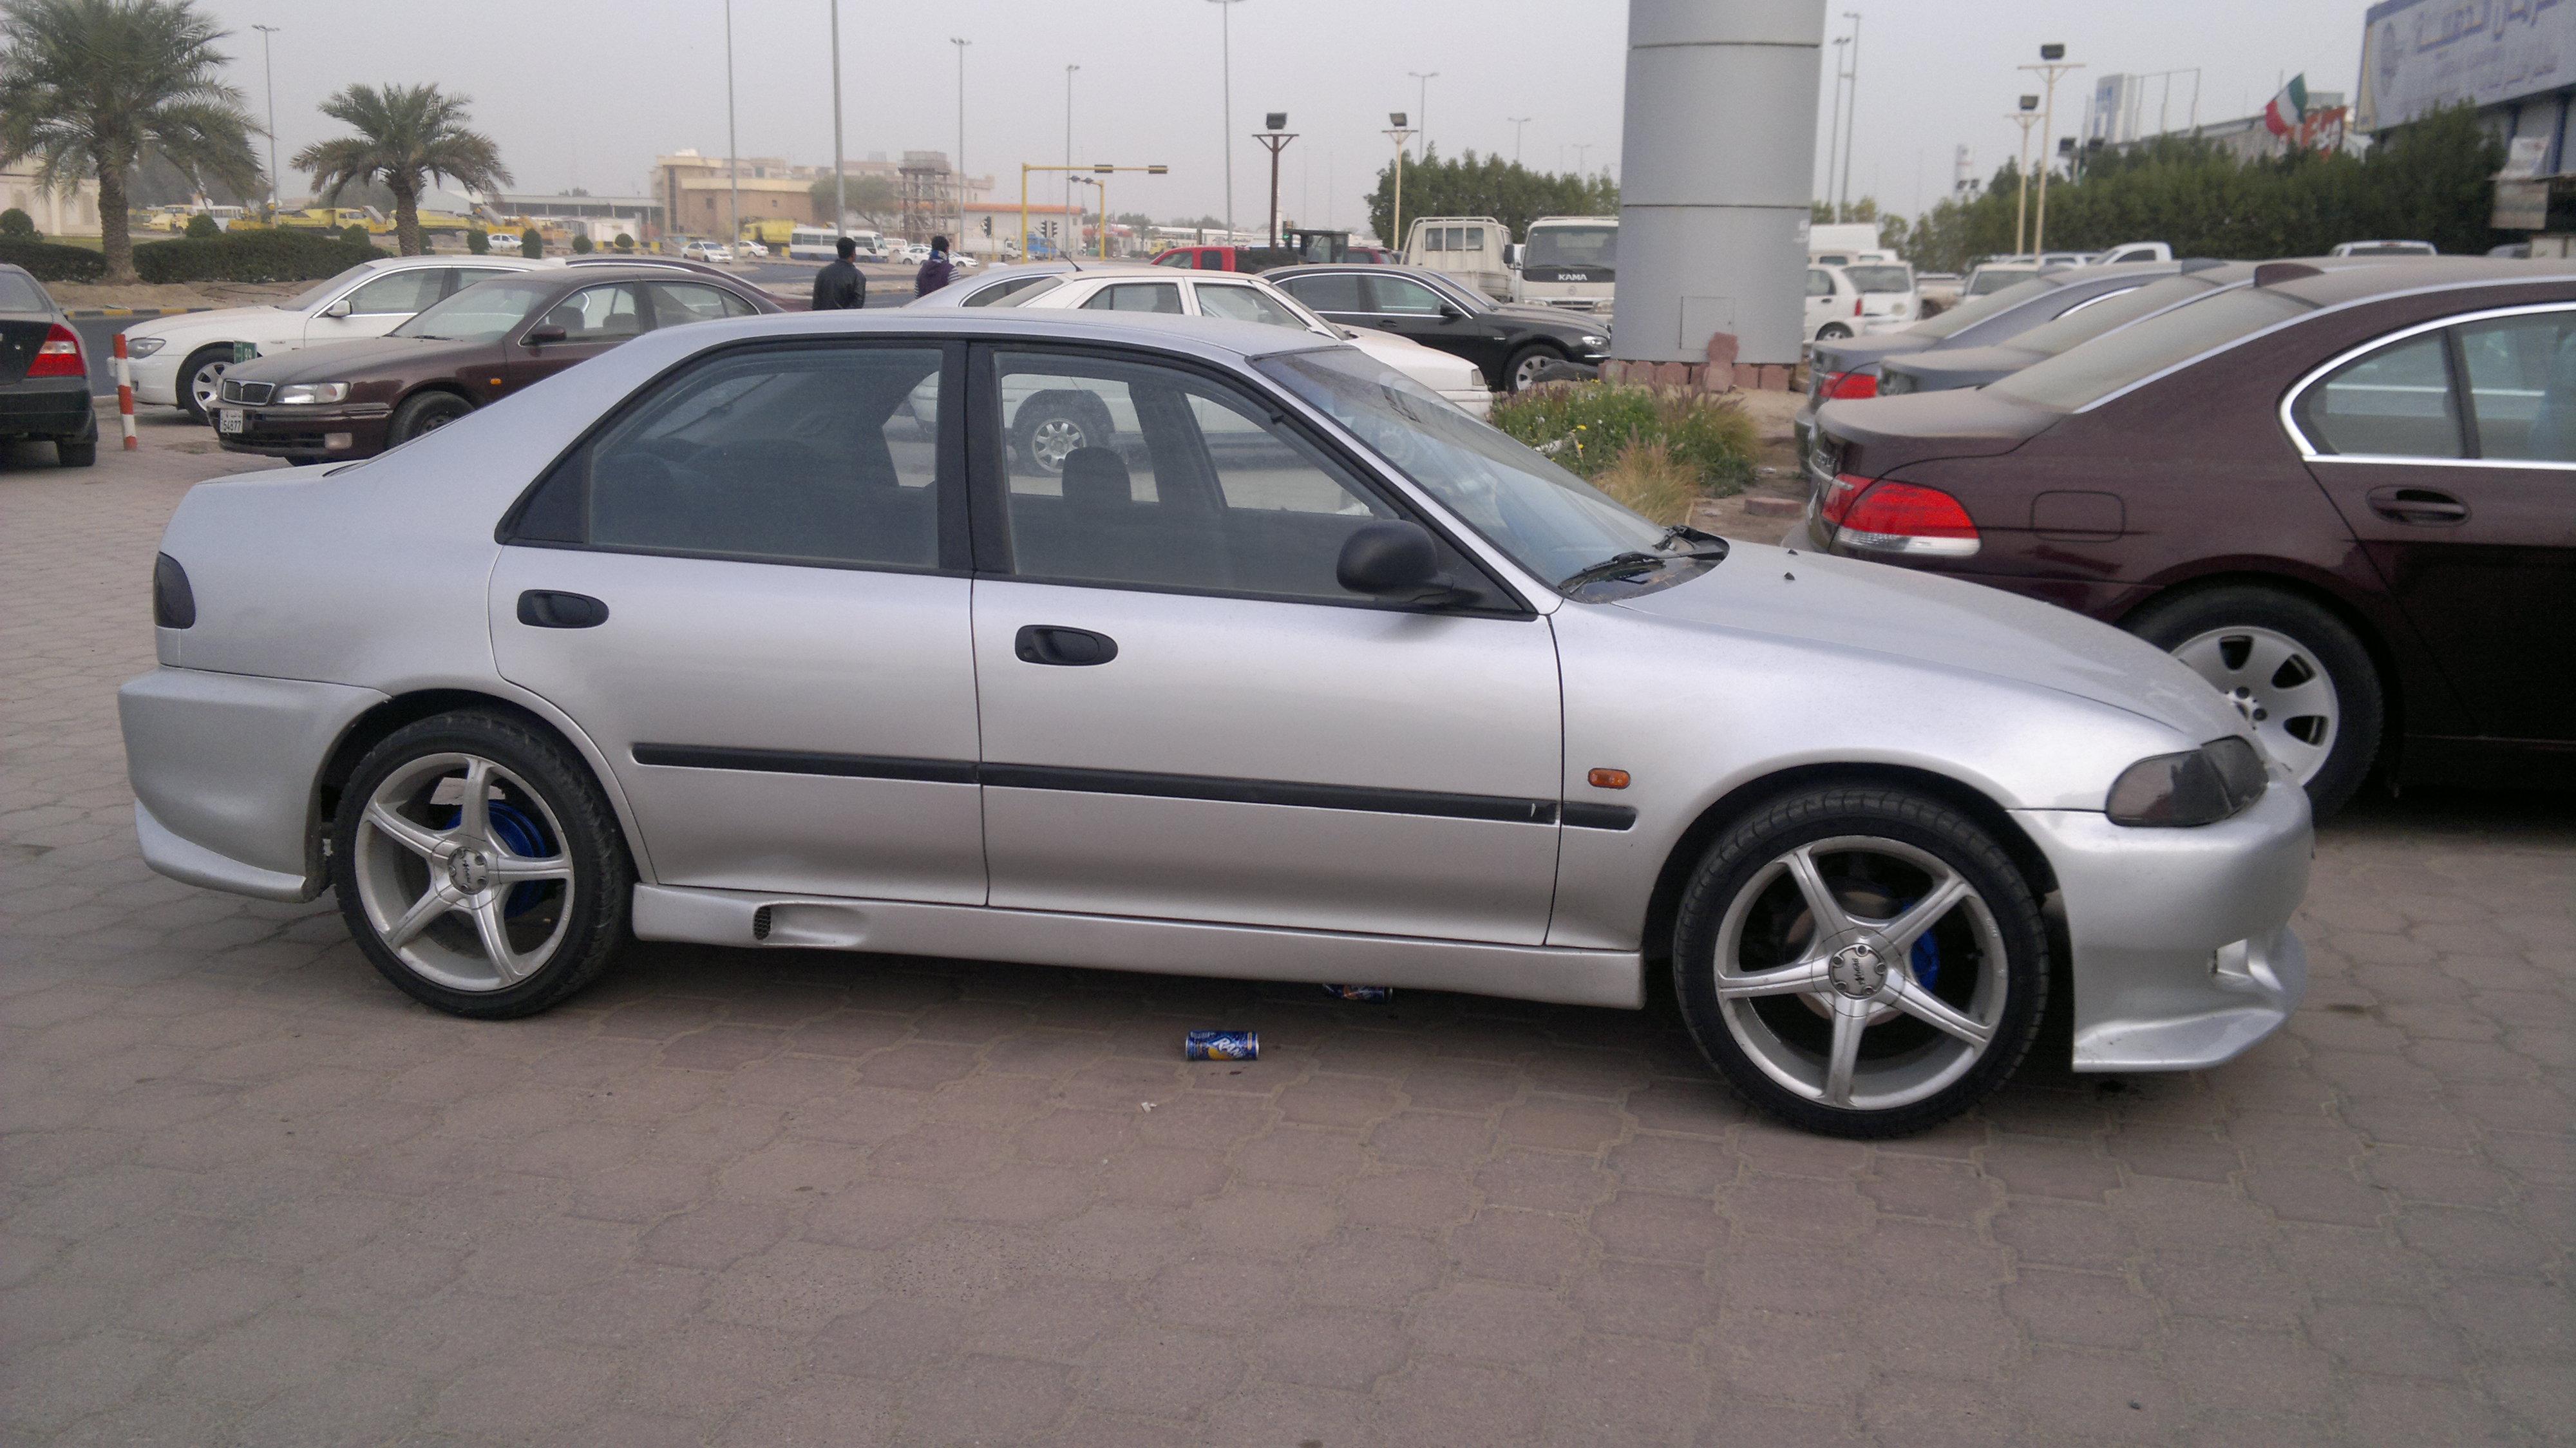 Sell My Car Online Free >> Honda Civic 1995 of glardo - Member Ride 15206 | PakWheels